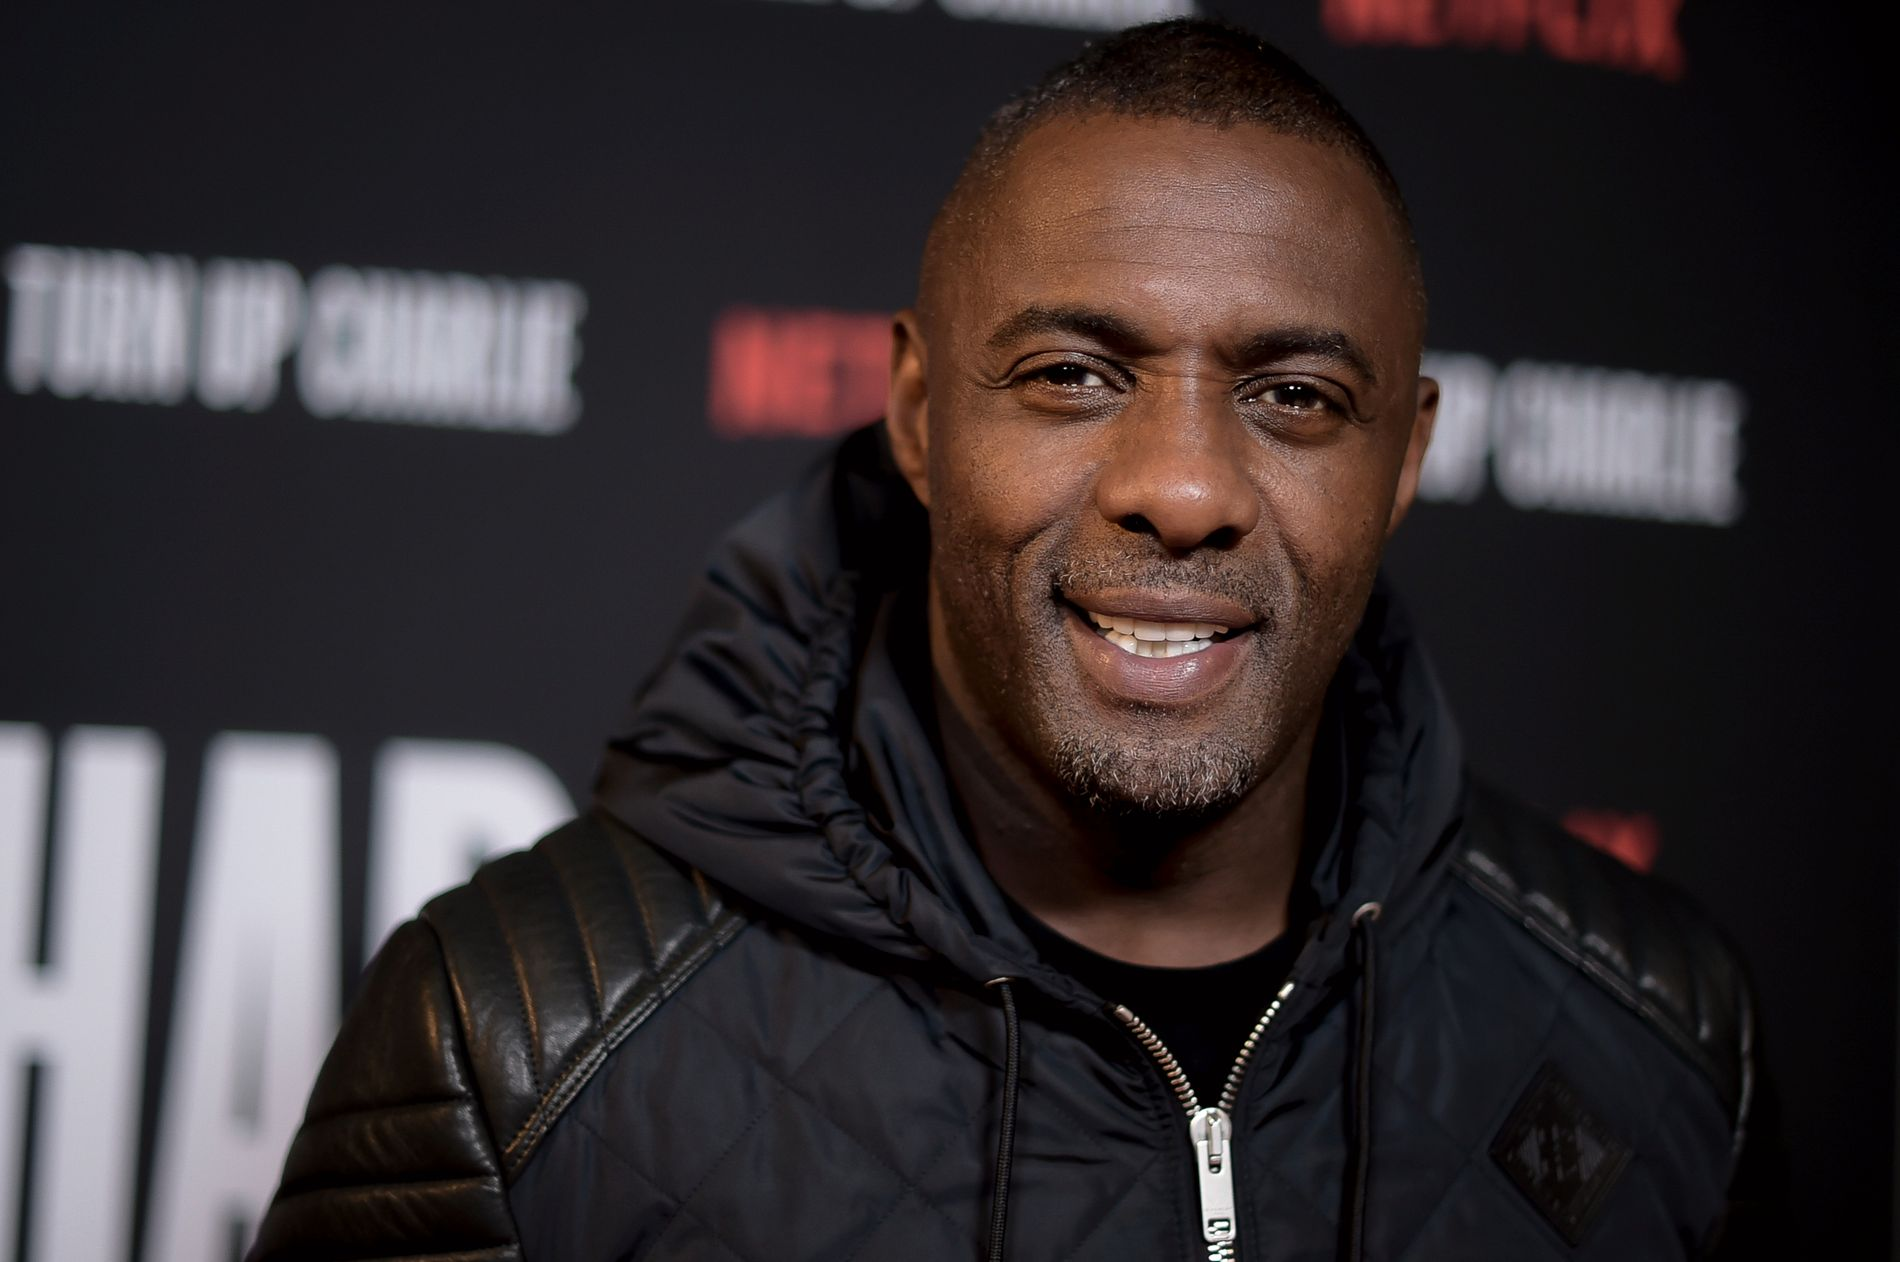 MULIG ERSTATTER: Idris Elba skal være i samtaler om rollen som Deadshot i «Suicide Squad»-oppfølgeren.